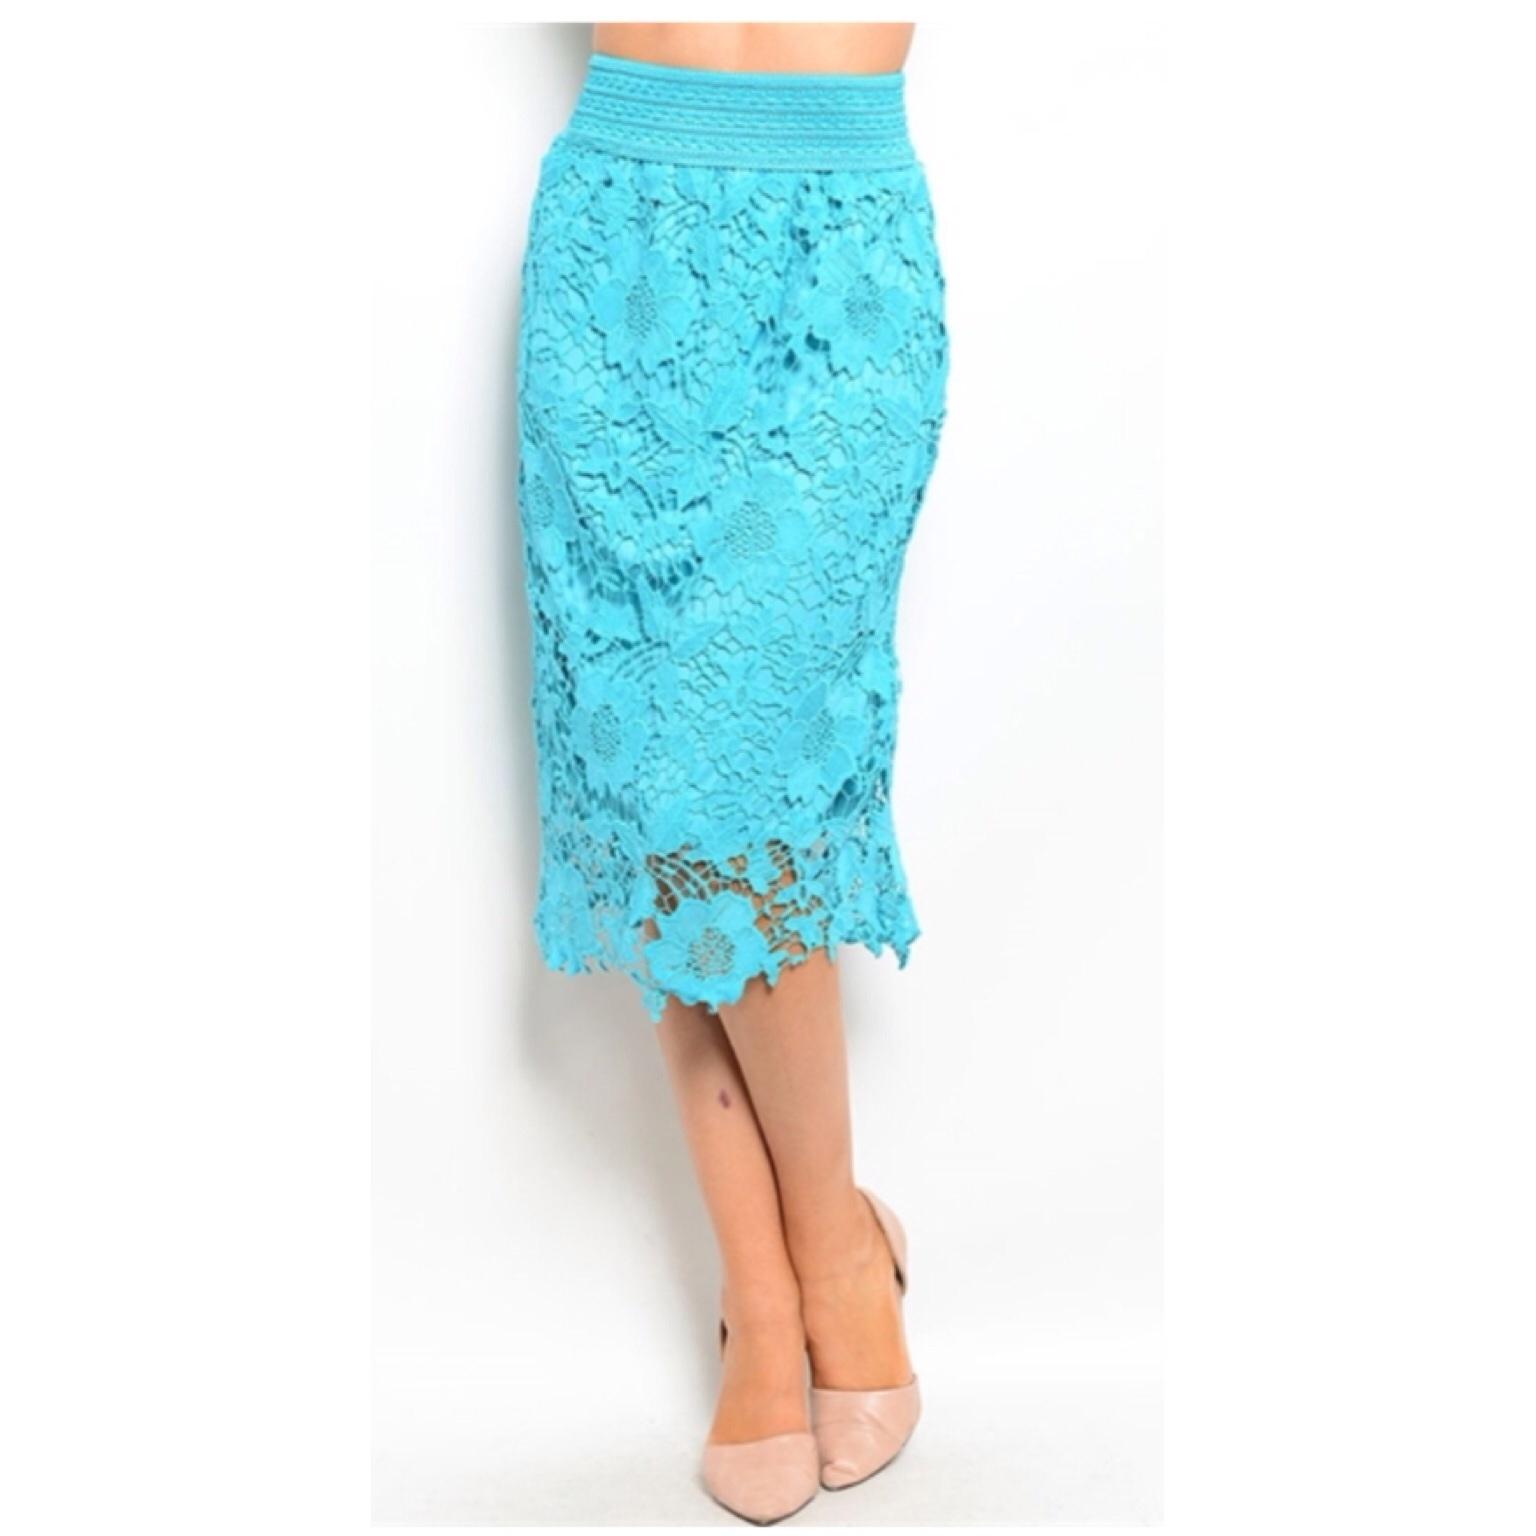 lace crochet midi skirt 183 modestlyhot 183 store